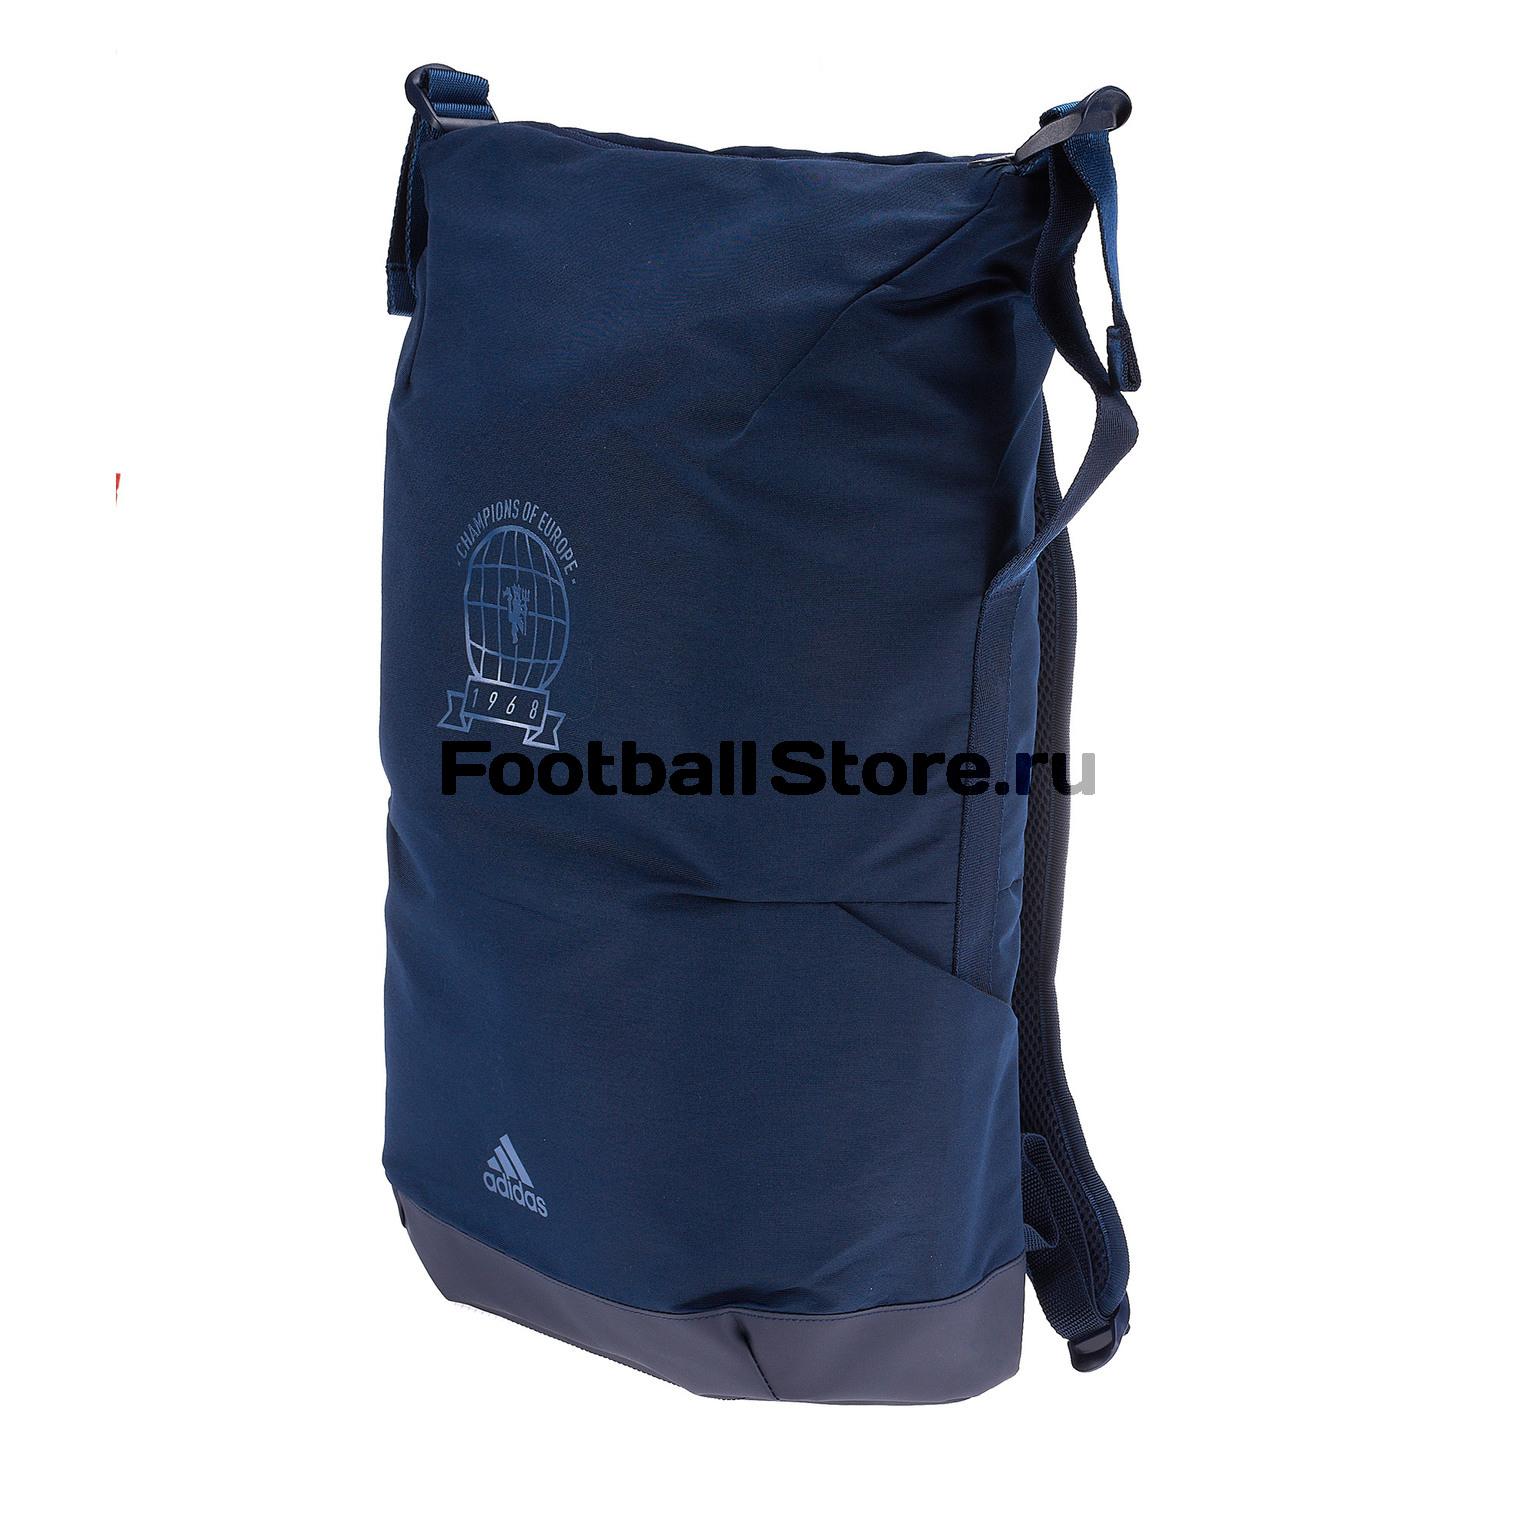 Рюкзак Adidas Manchester United CY5581 рюкзак adidas manchester united cy5581